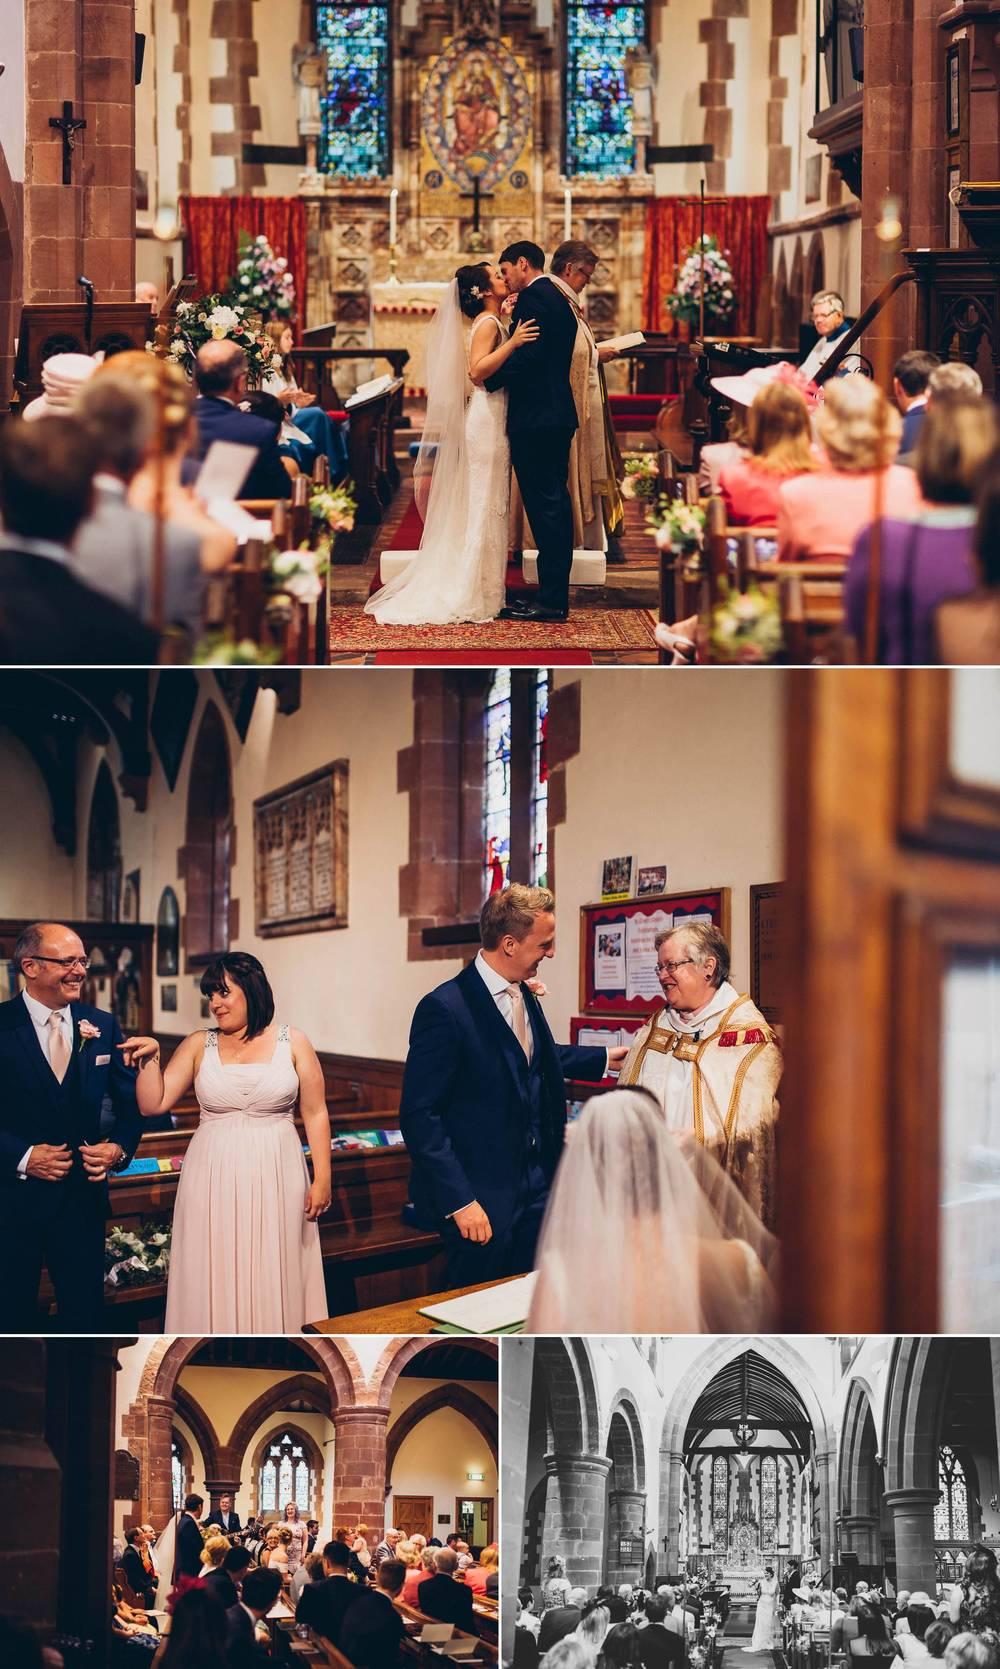 pendrell-hall-wedding-photography 7.jpg